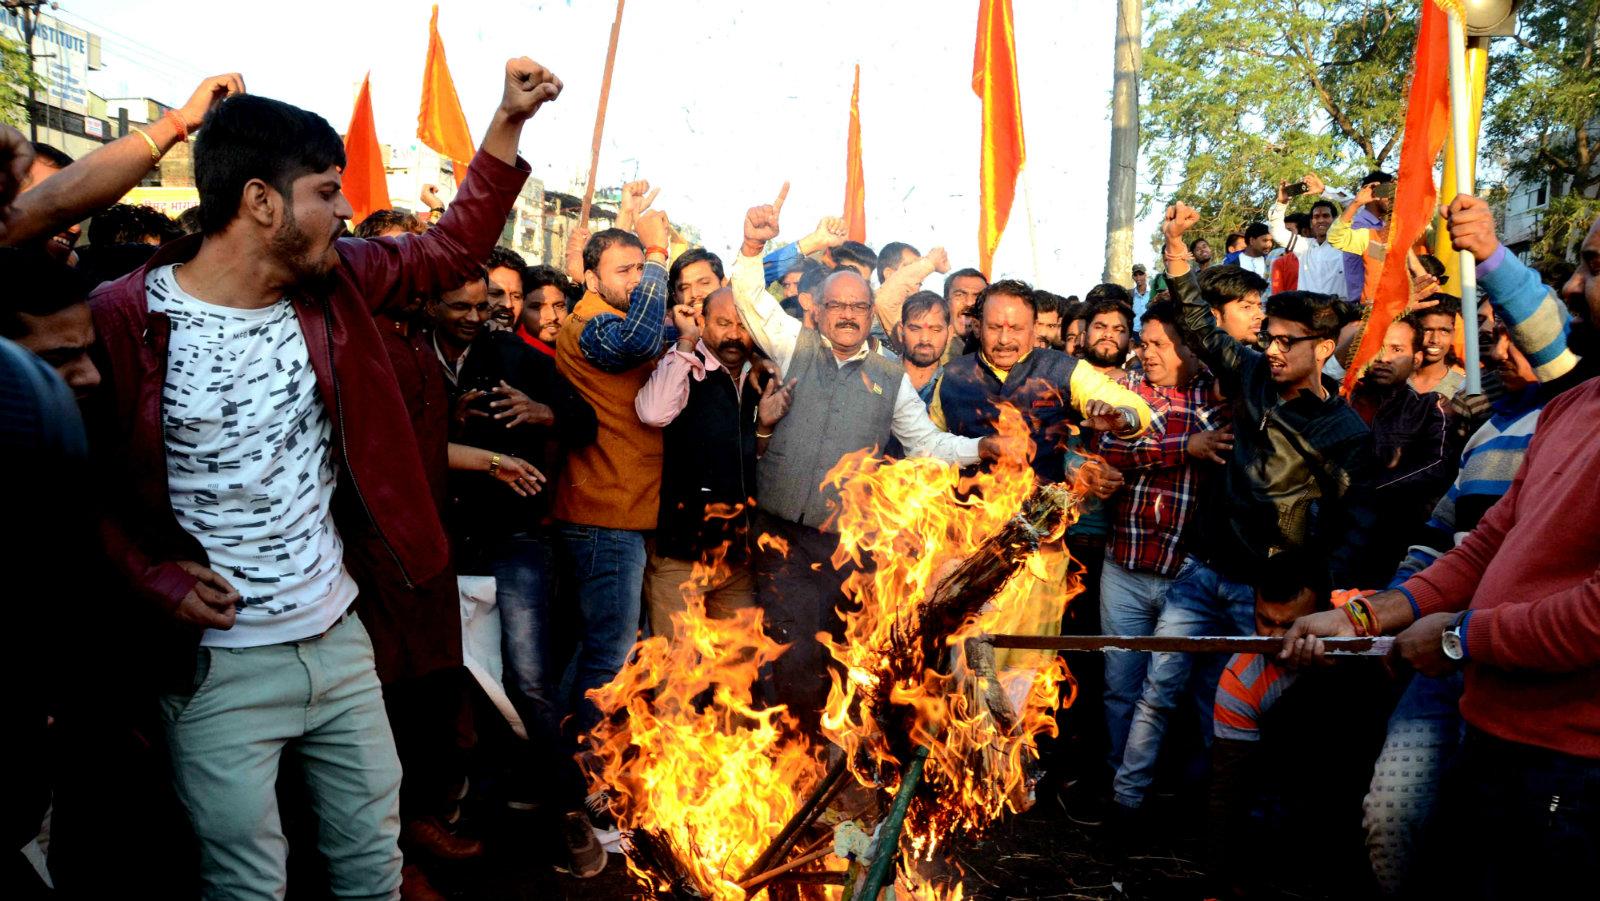 India-communalism-Hindu-Muslim-conflict